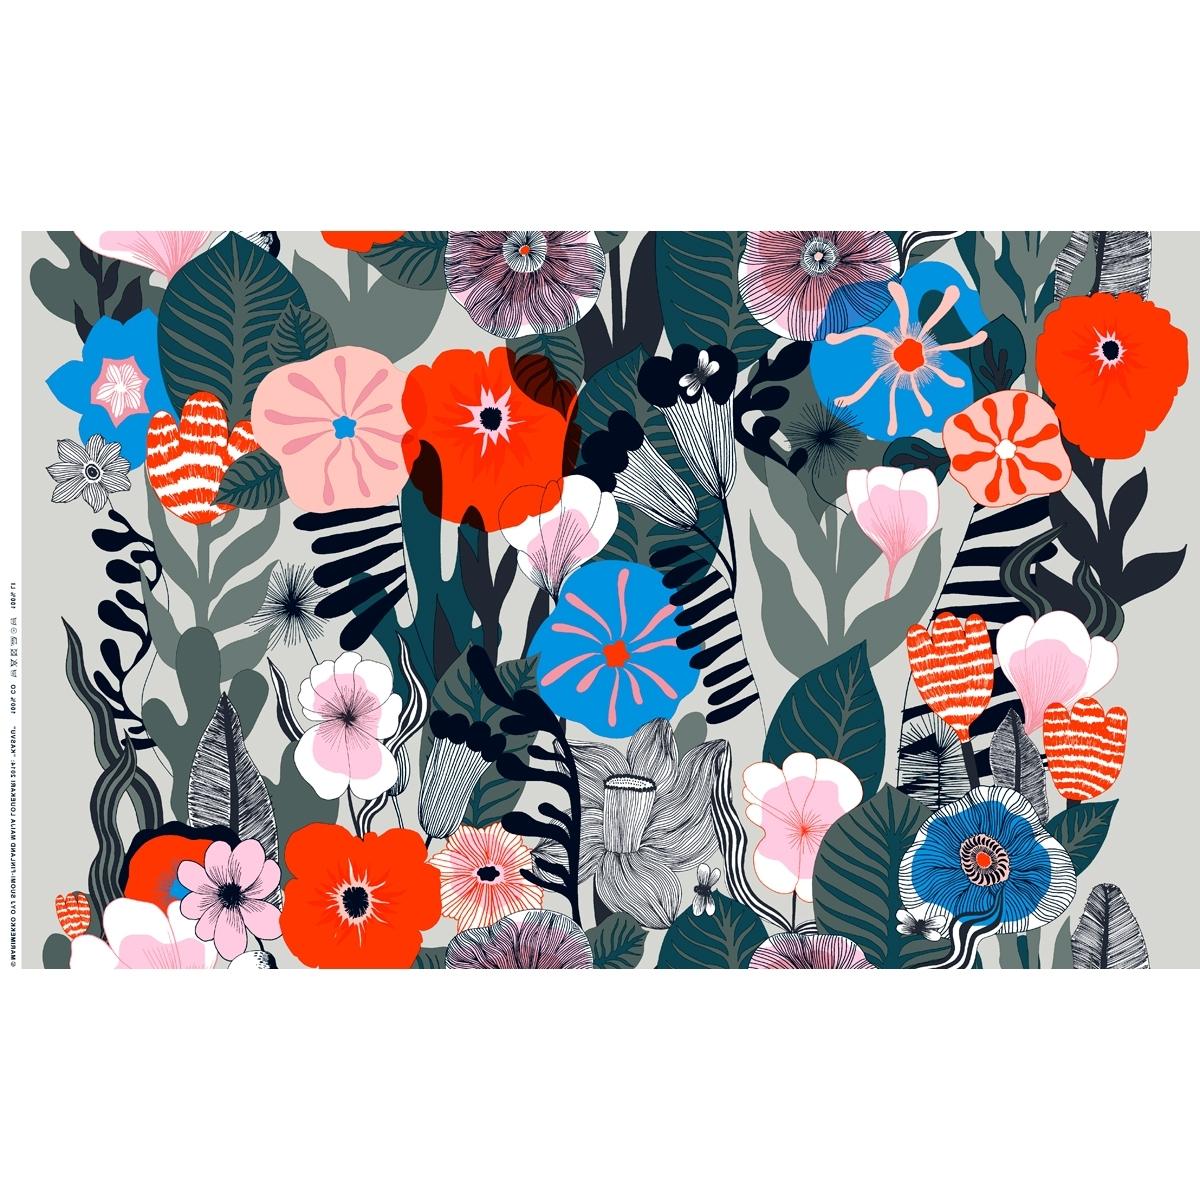 Home Within Marimekko 'karkuteilla' Fabric Wall Art (View 7 of 15)